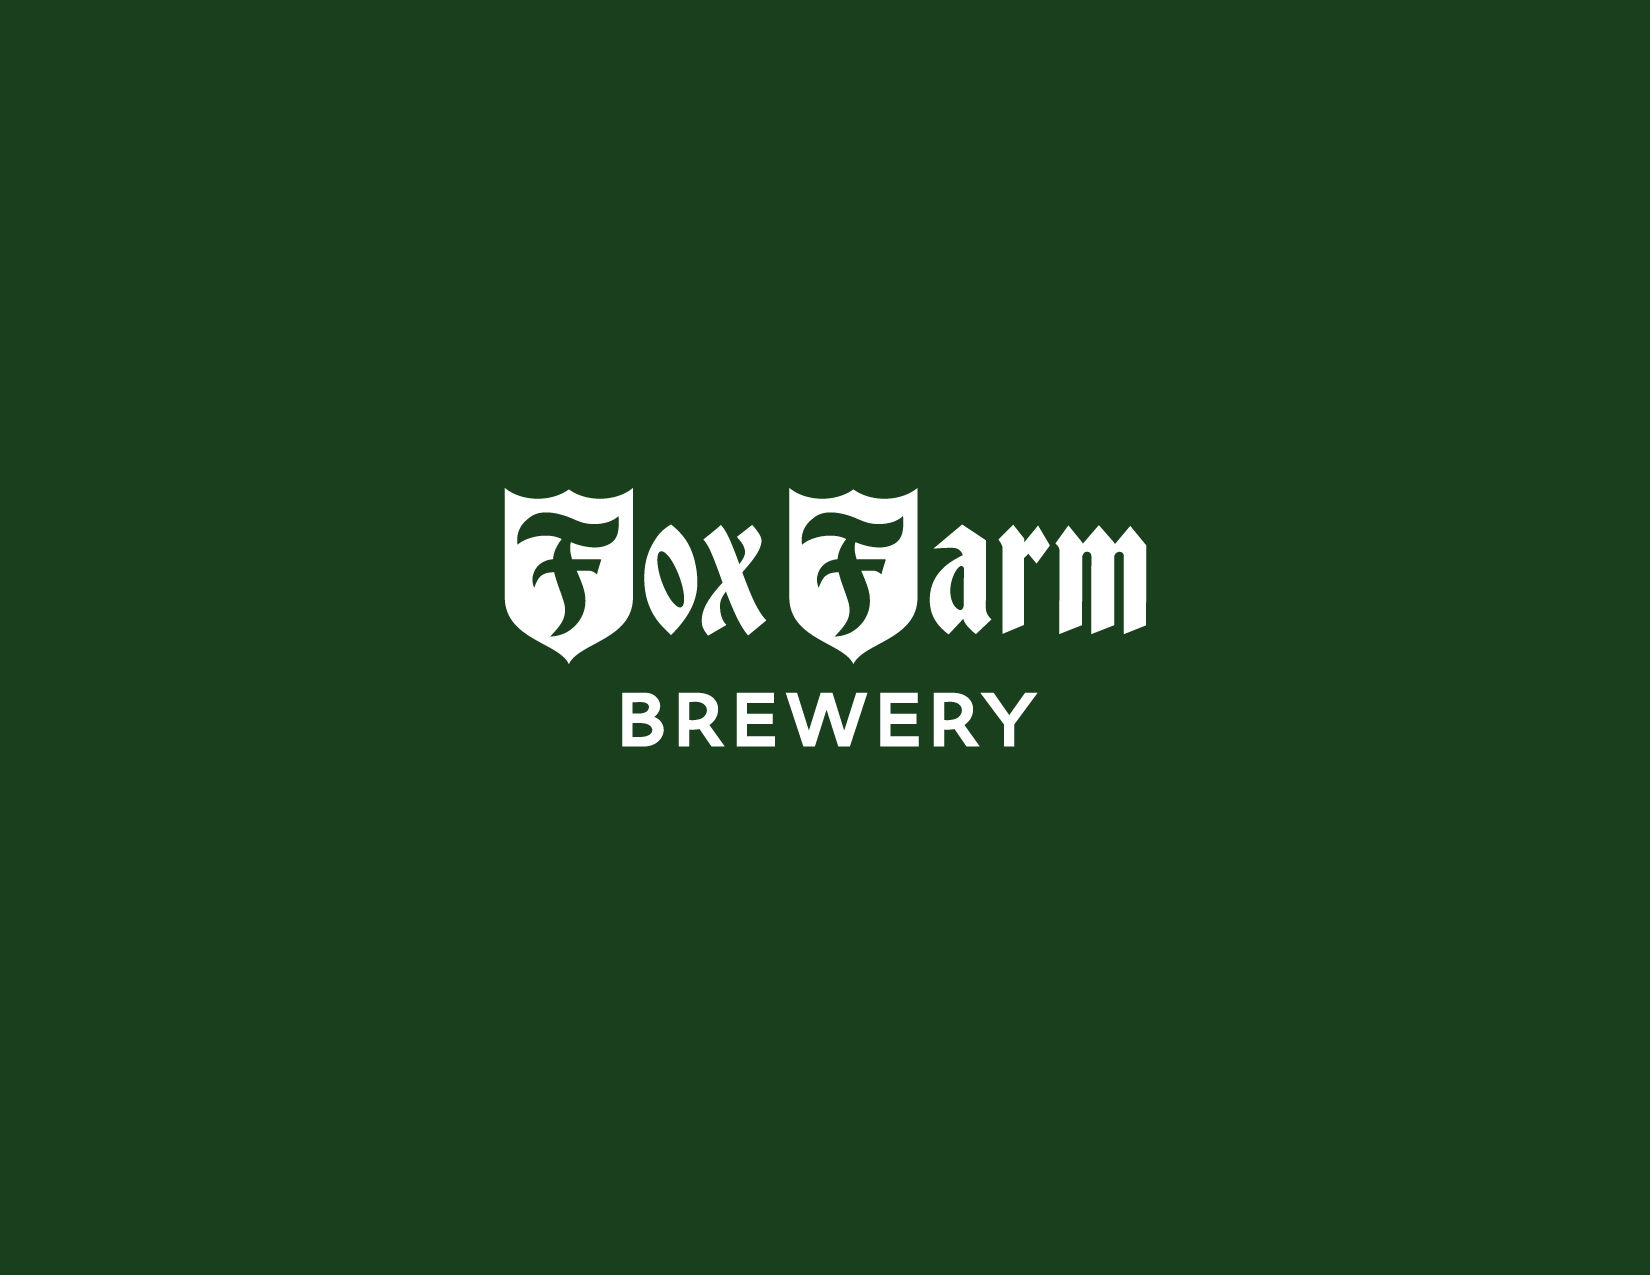 FoxFarm_Logo-02.png